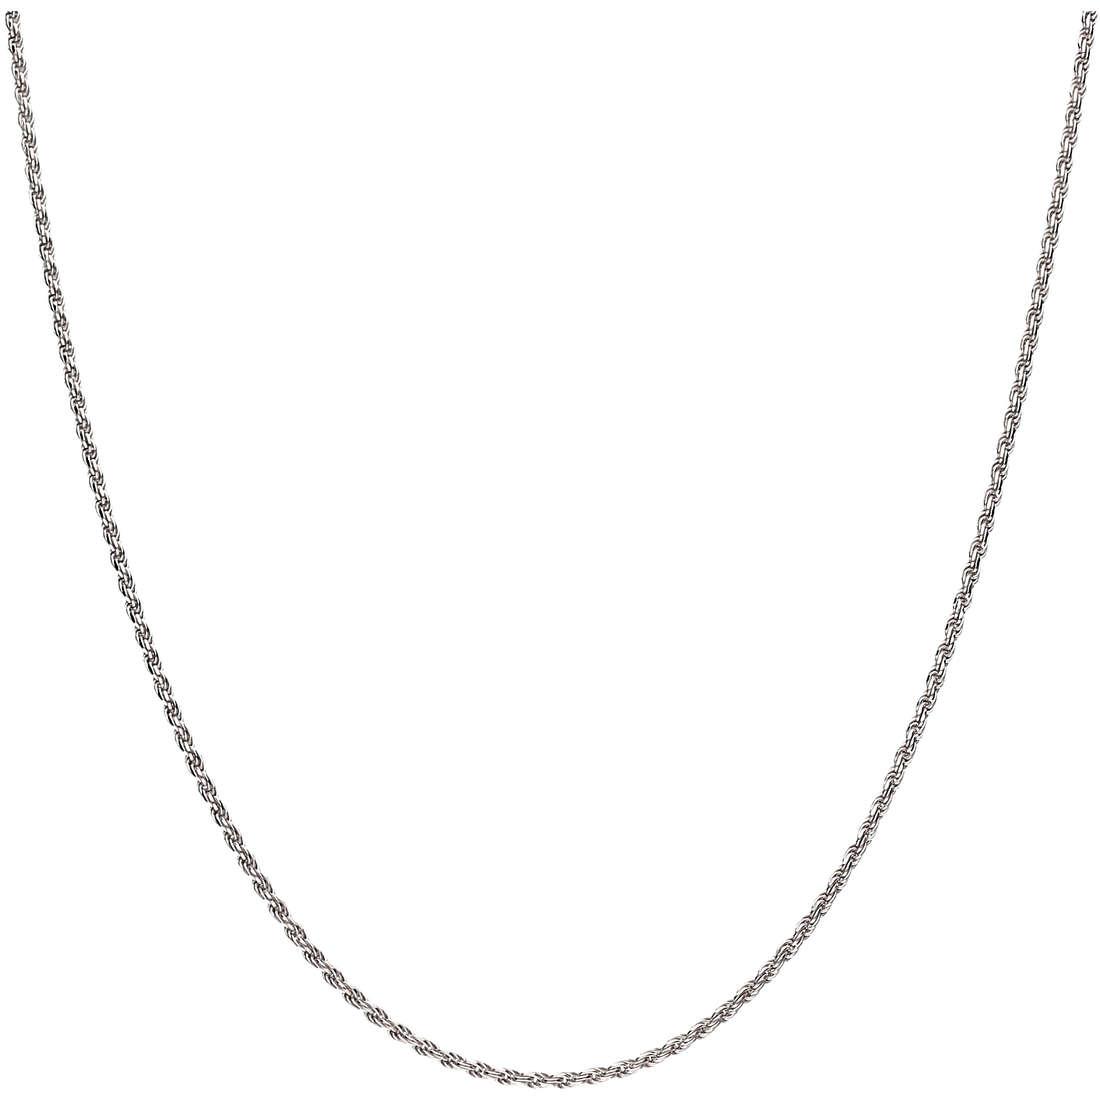 collana donna gioielli GioiaPura GPSRBS0373F-R-45